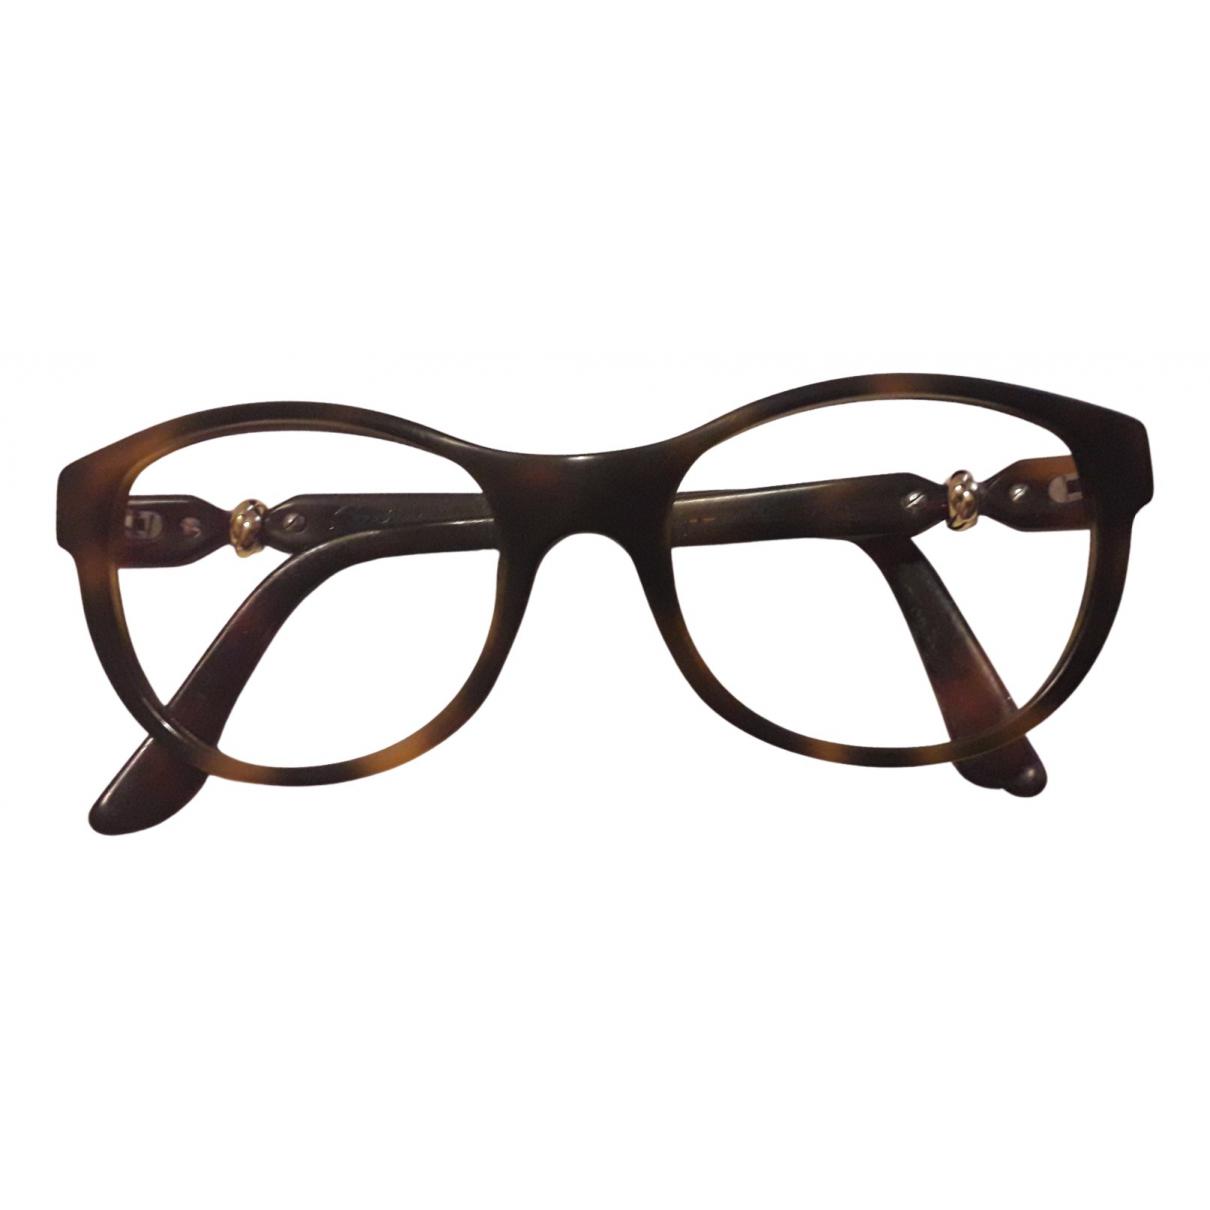 Cartier N Brown Sunglasses for Women N